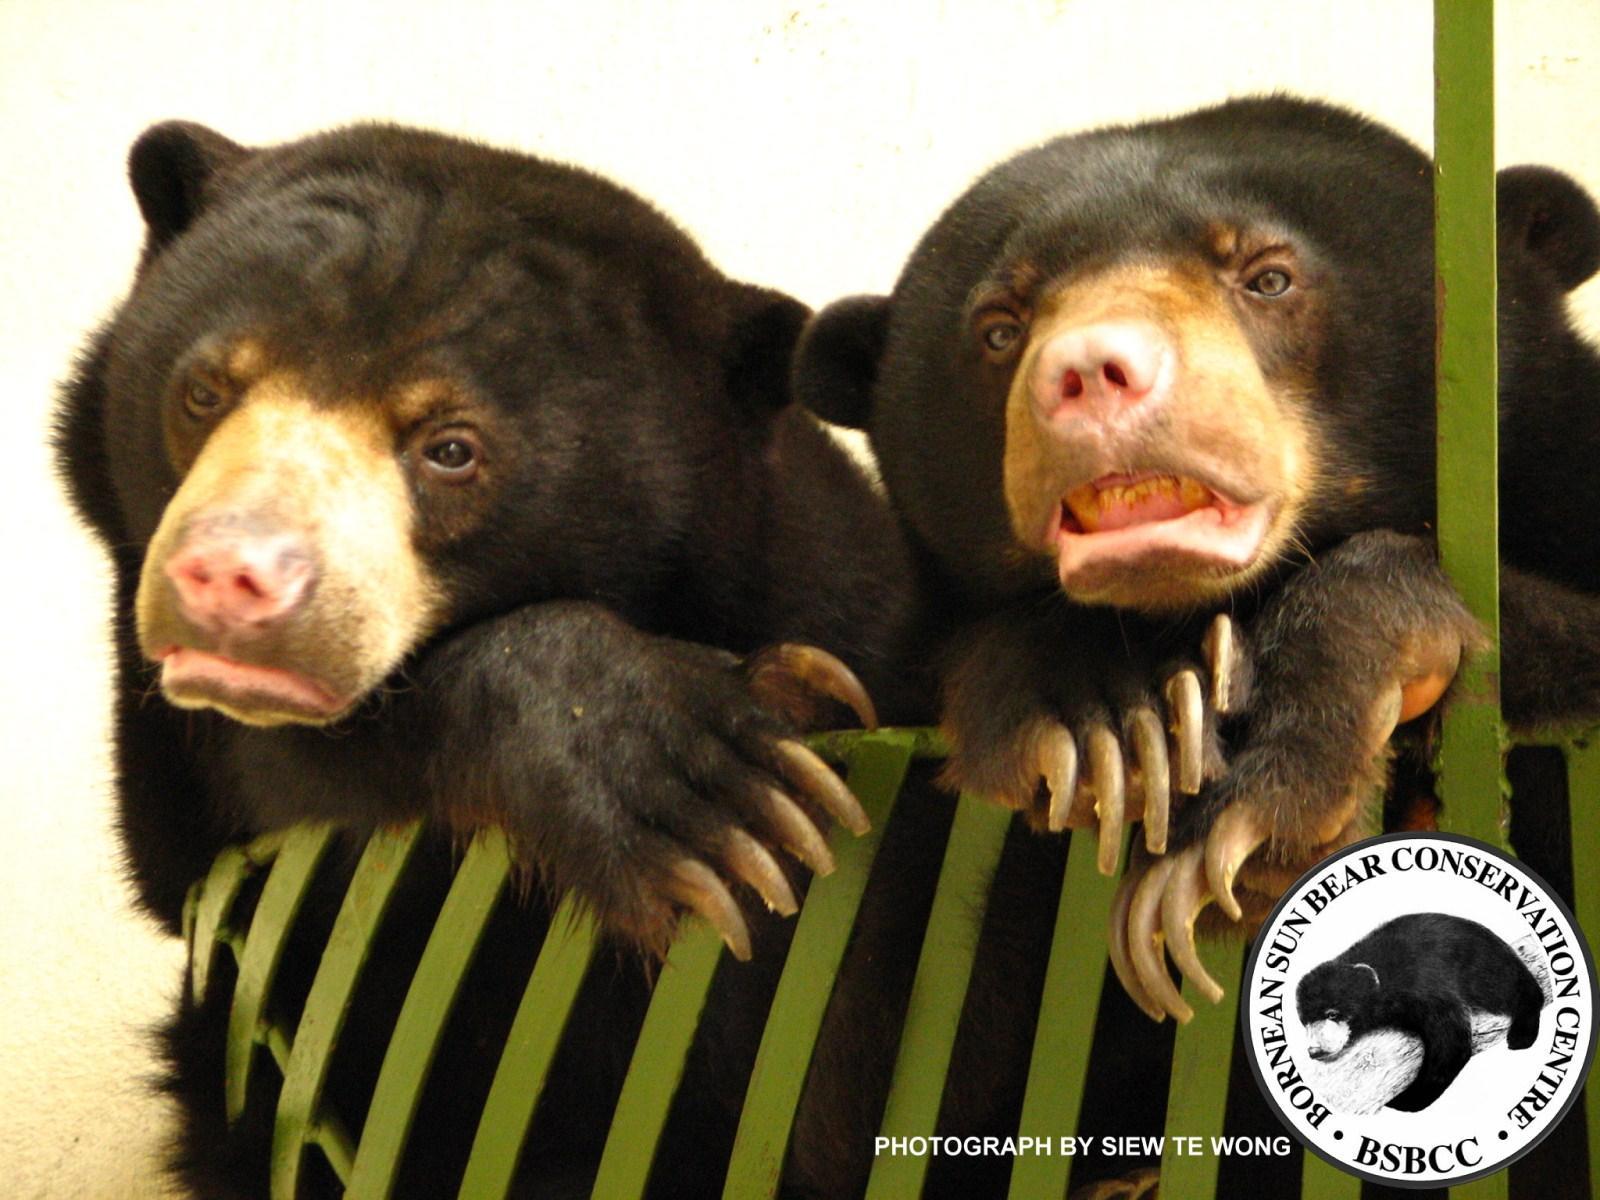 7eabcaaf5ba znd sep oct 2010 - American Association of Zoo Veterinarians (AAZV)